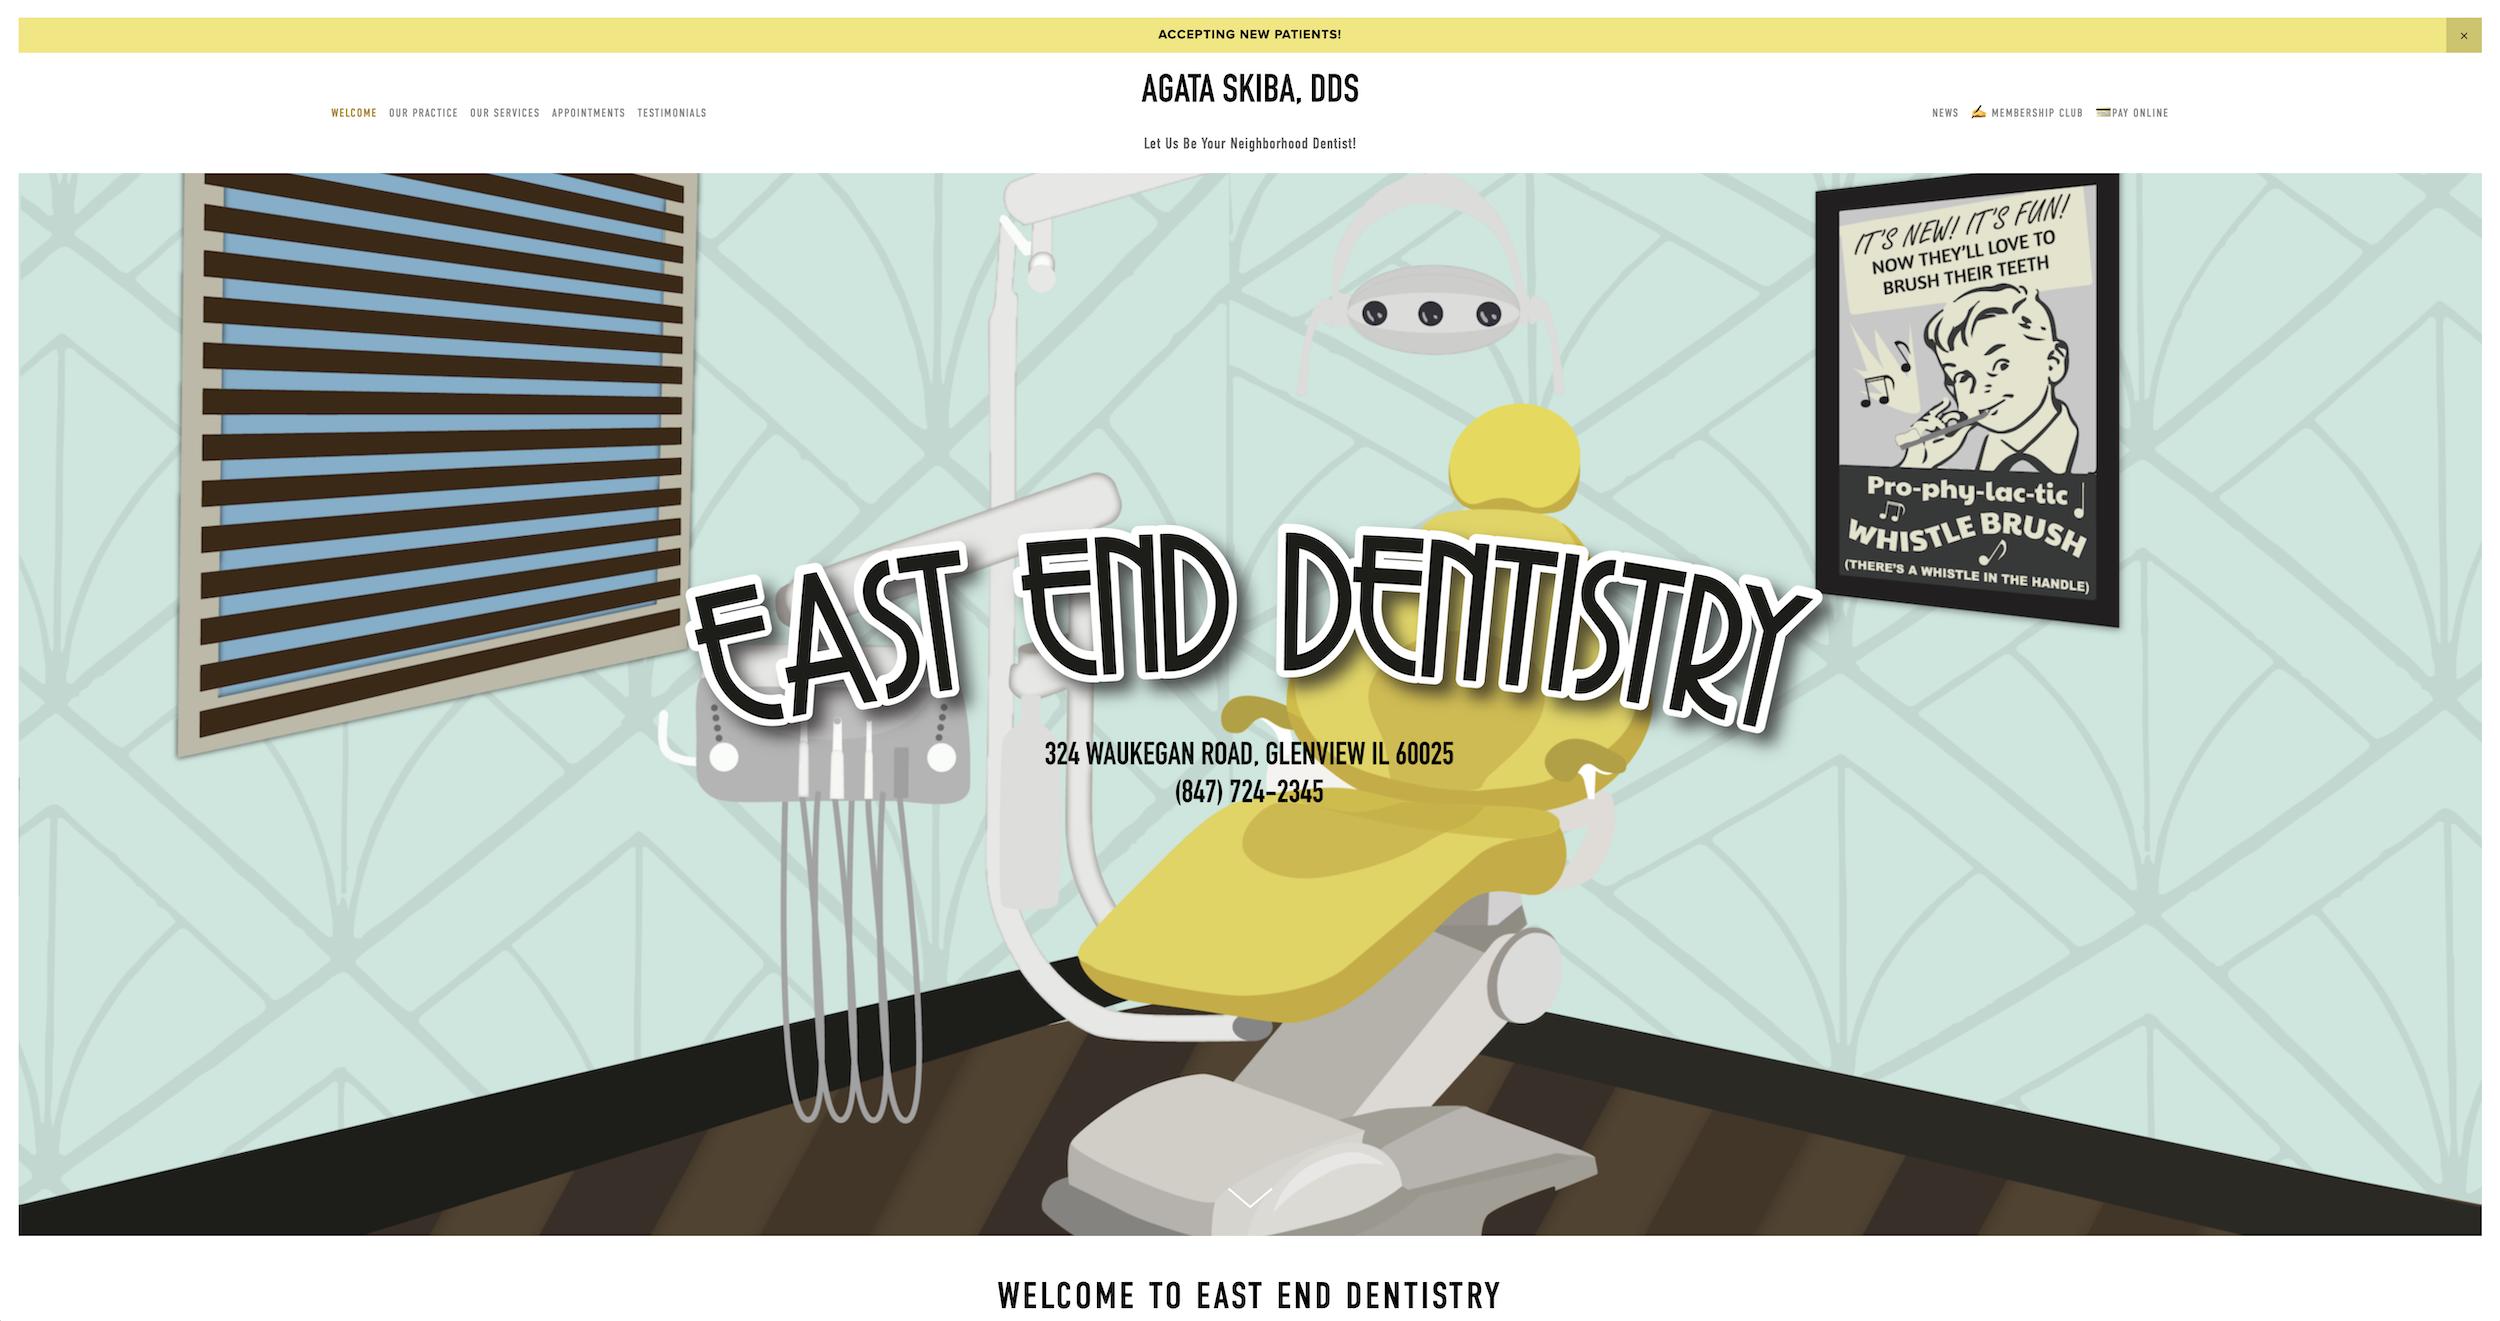 East End Dentistry Agata Skiba DDS.png